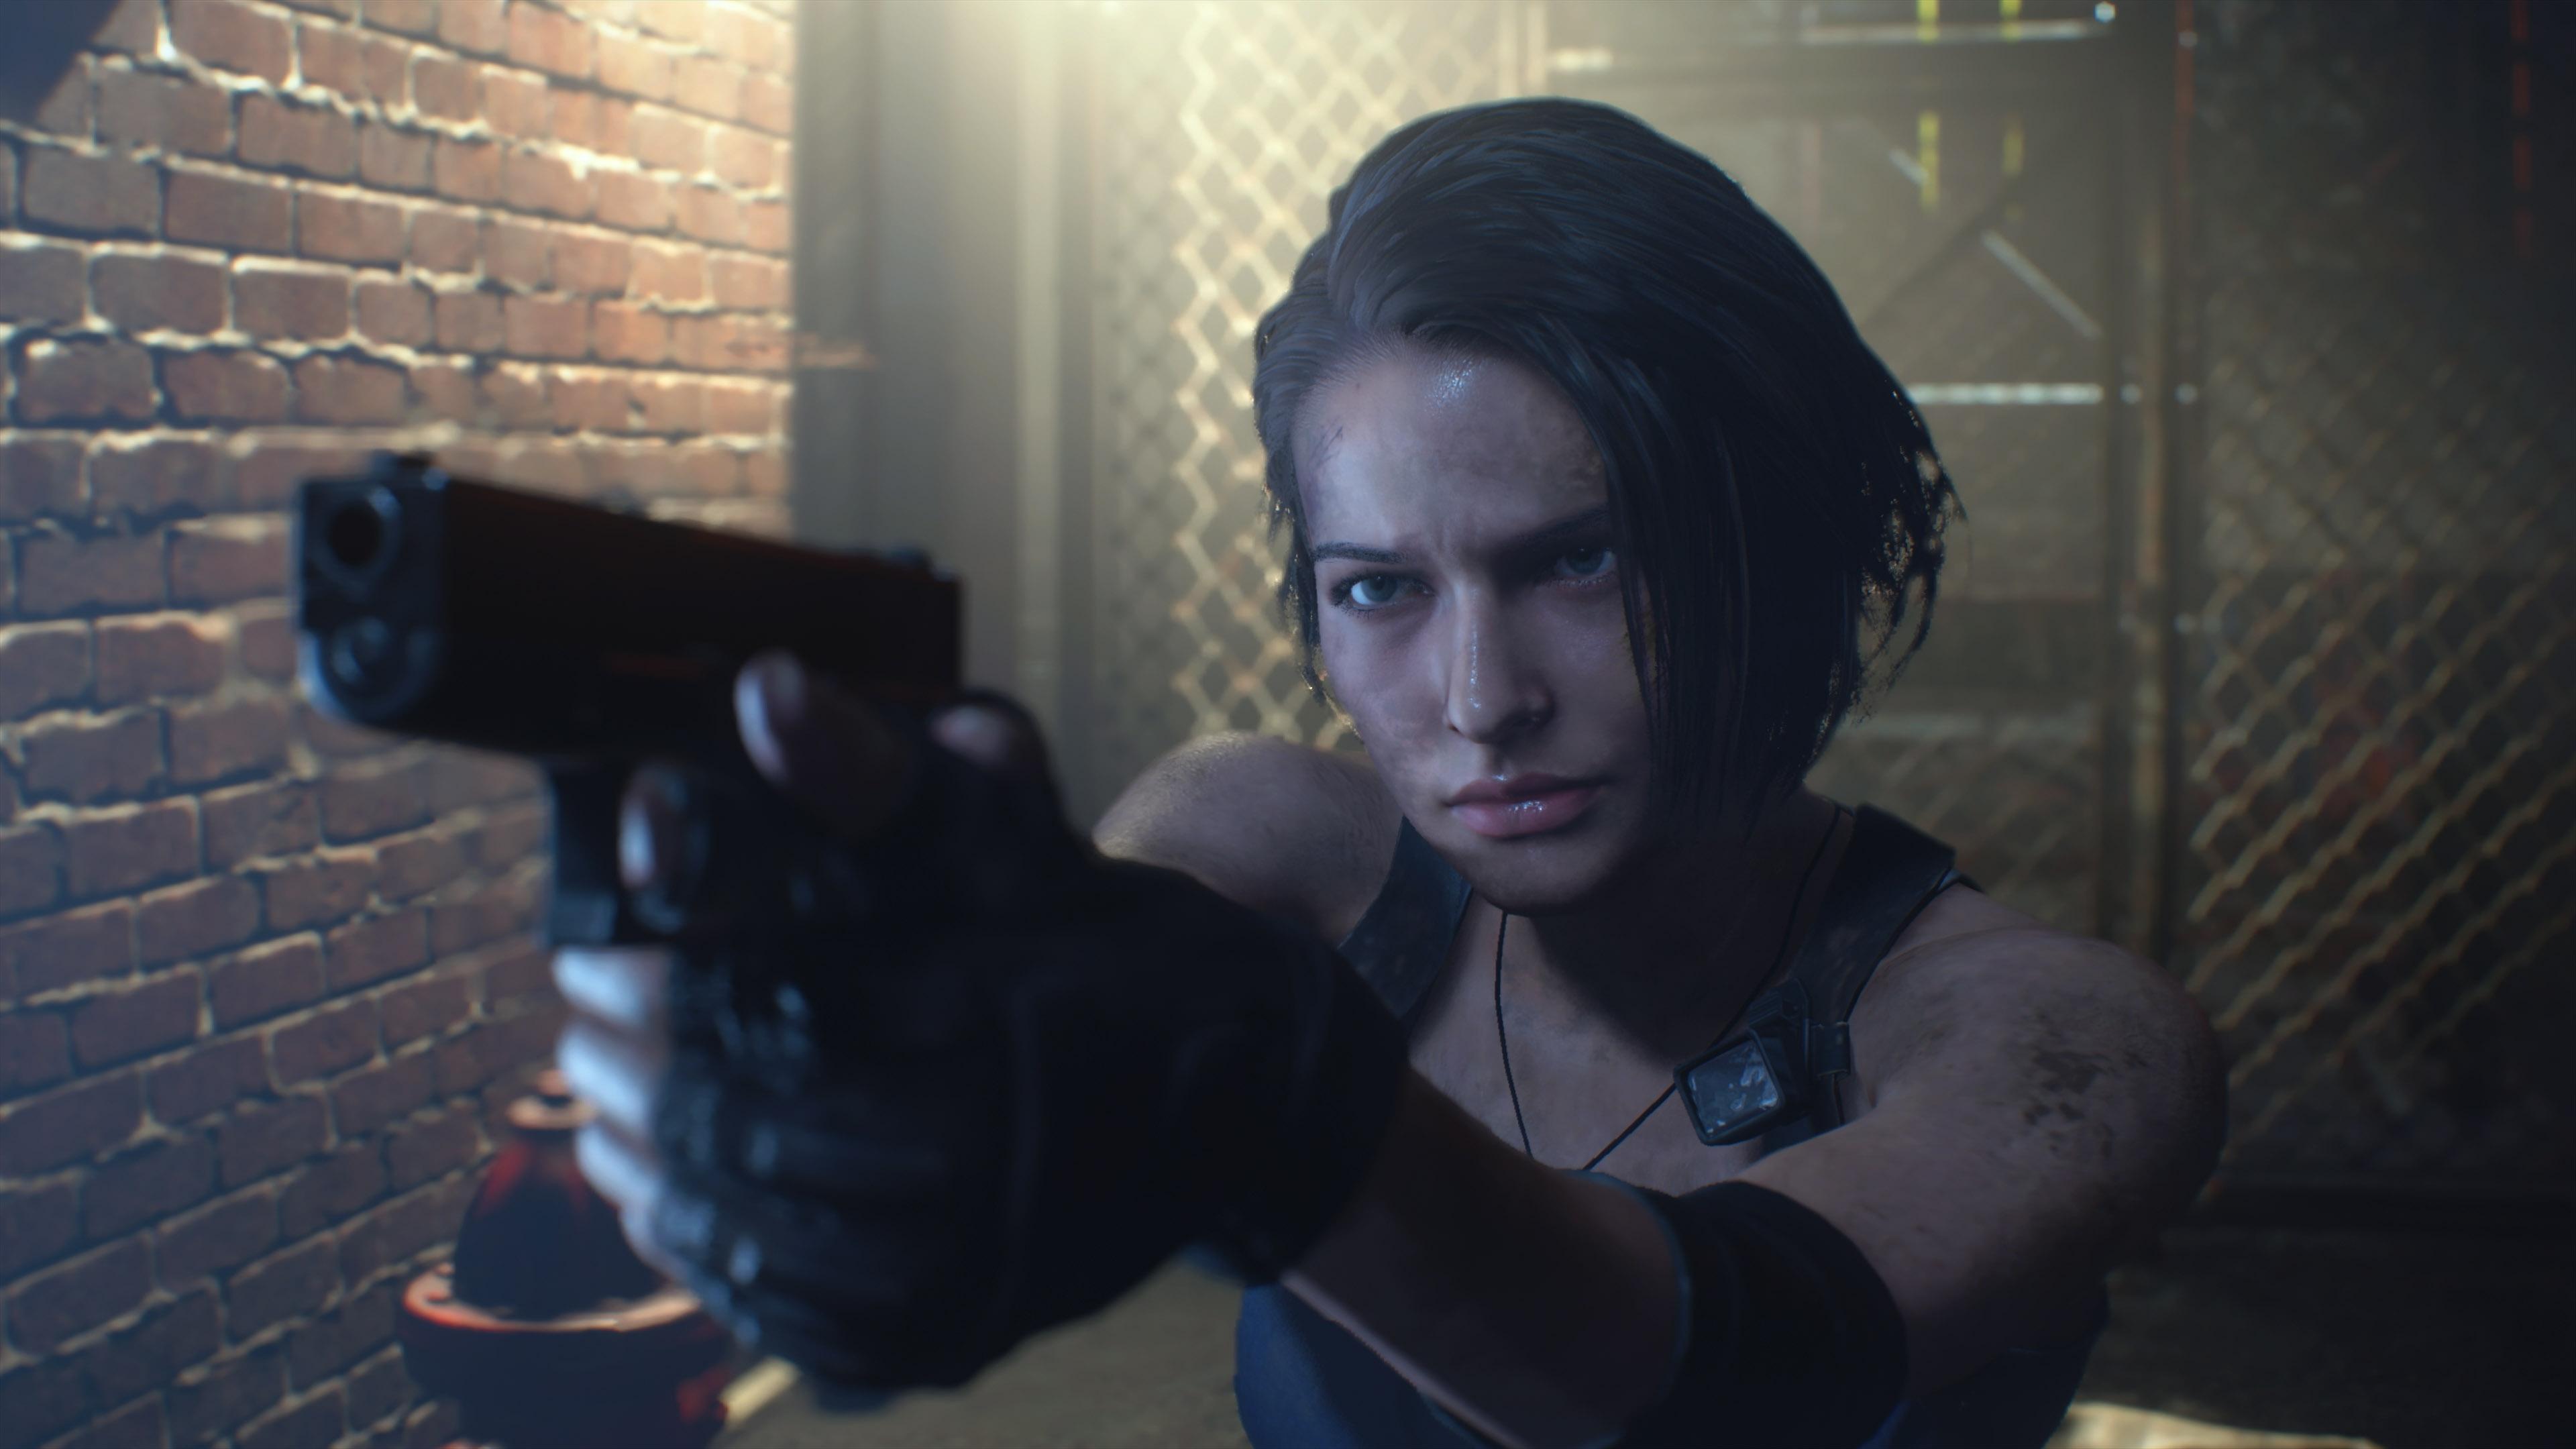 Оценки ремейка Resident Evil 3 - хуже ремейка второй части